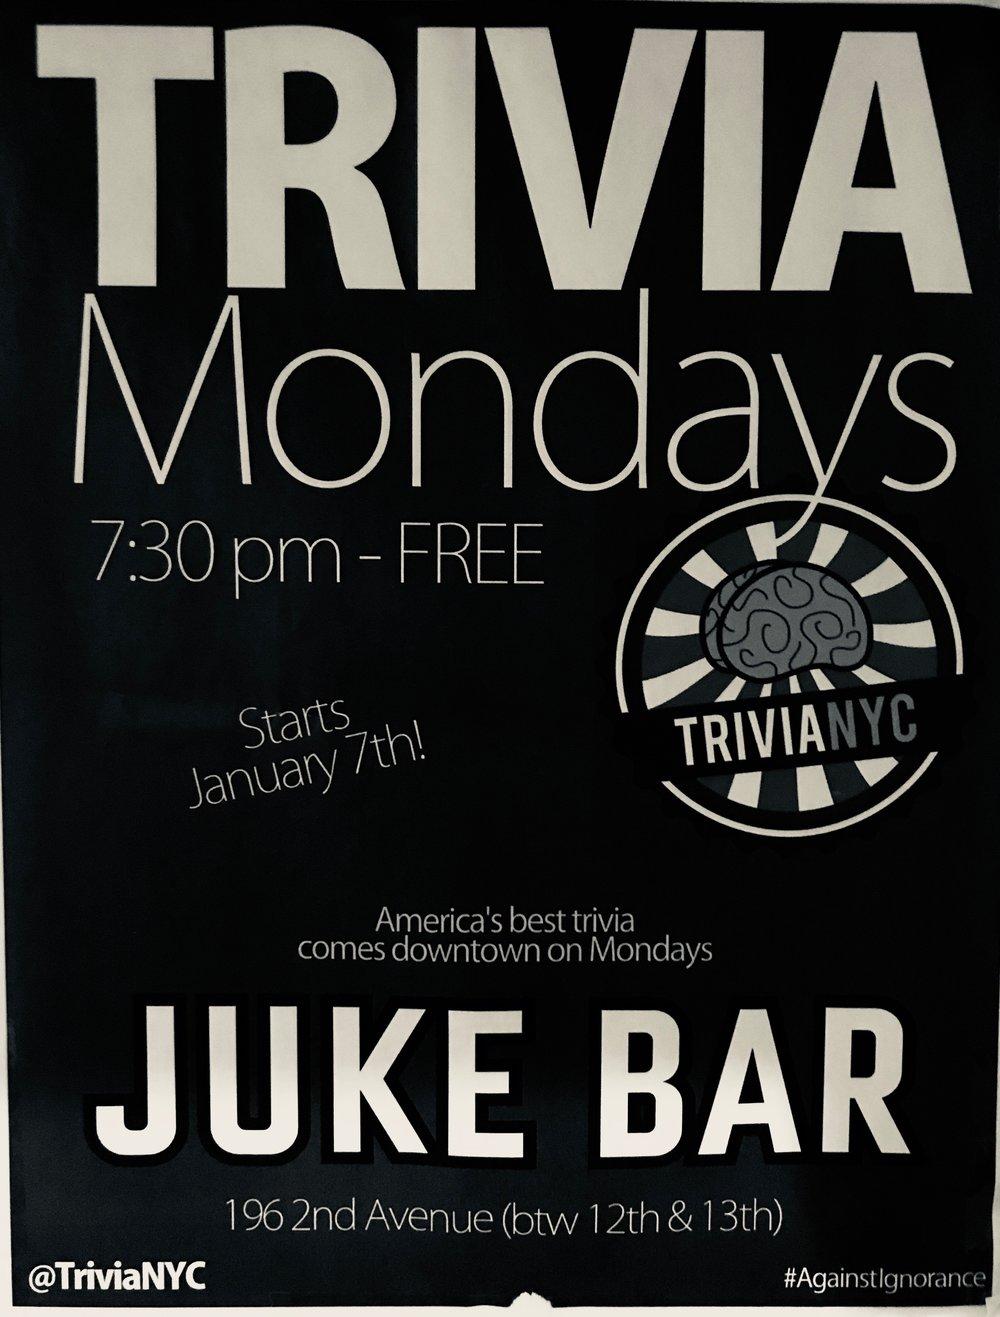 Juke_bar_trivia.jpg